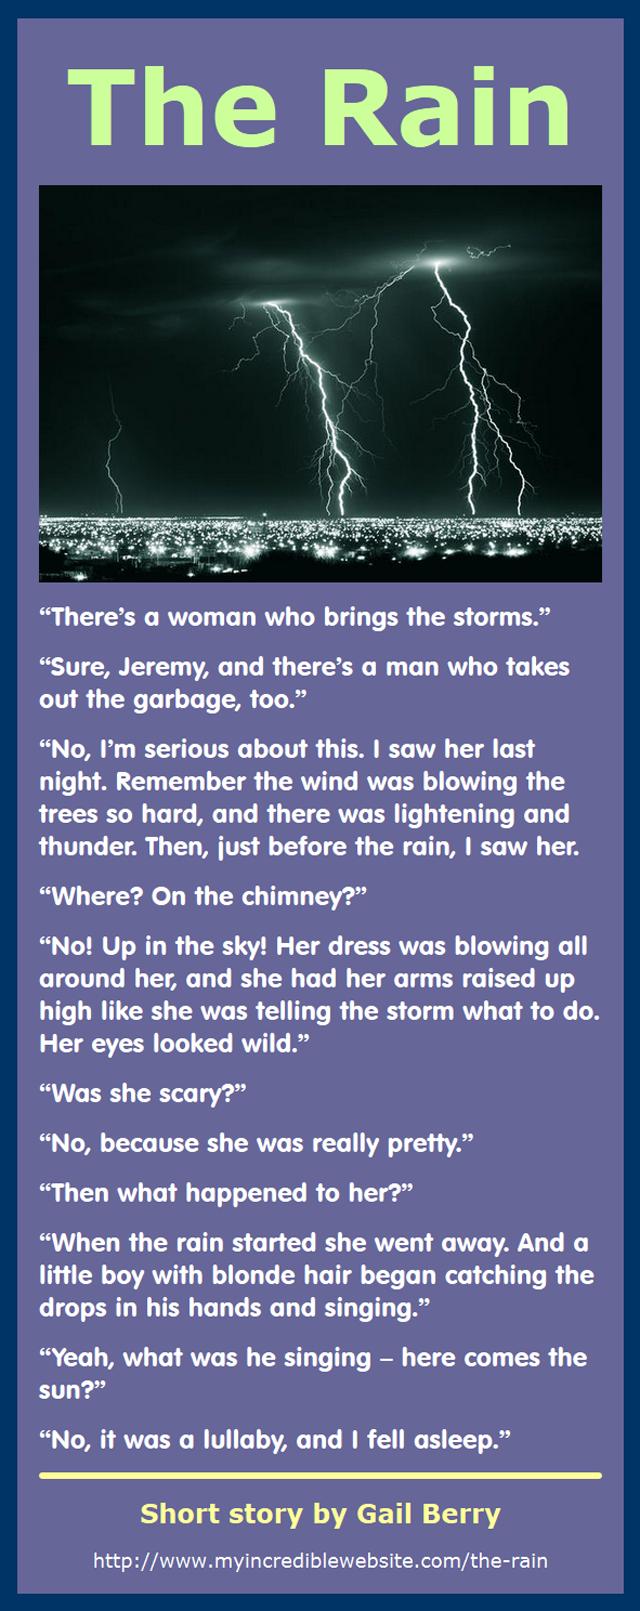 The Rain by Gail Berry